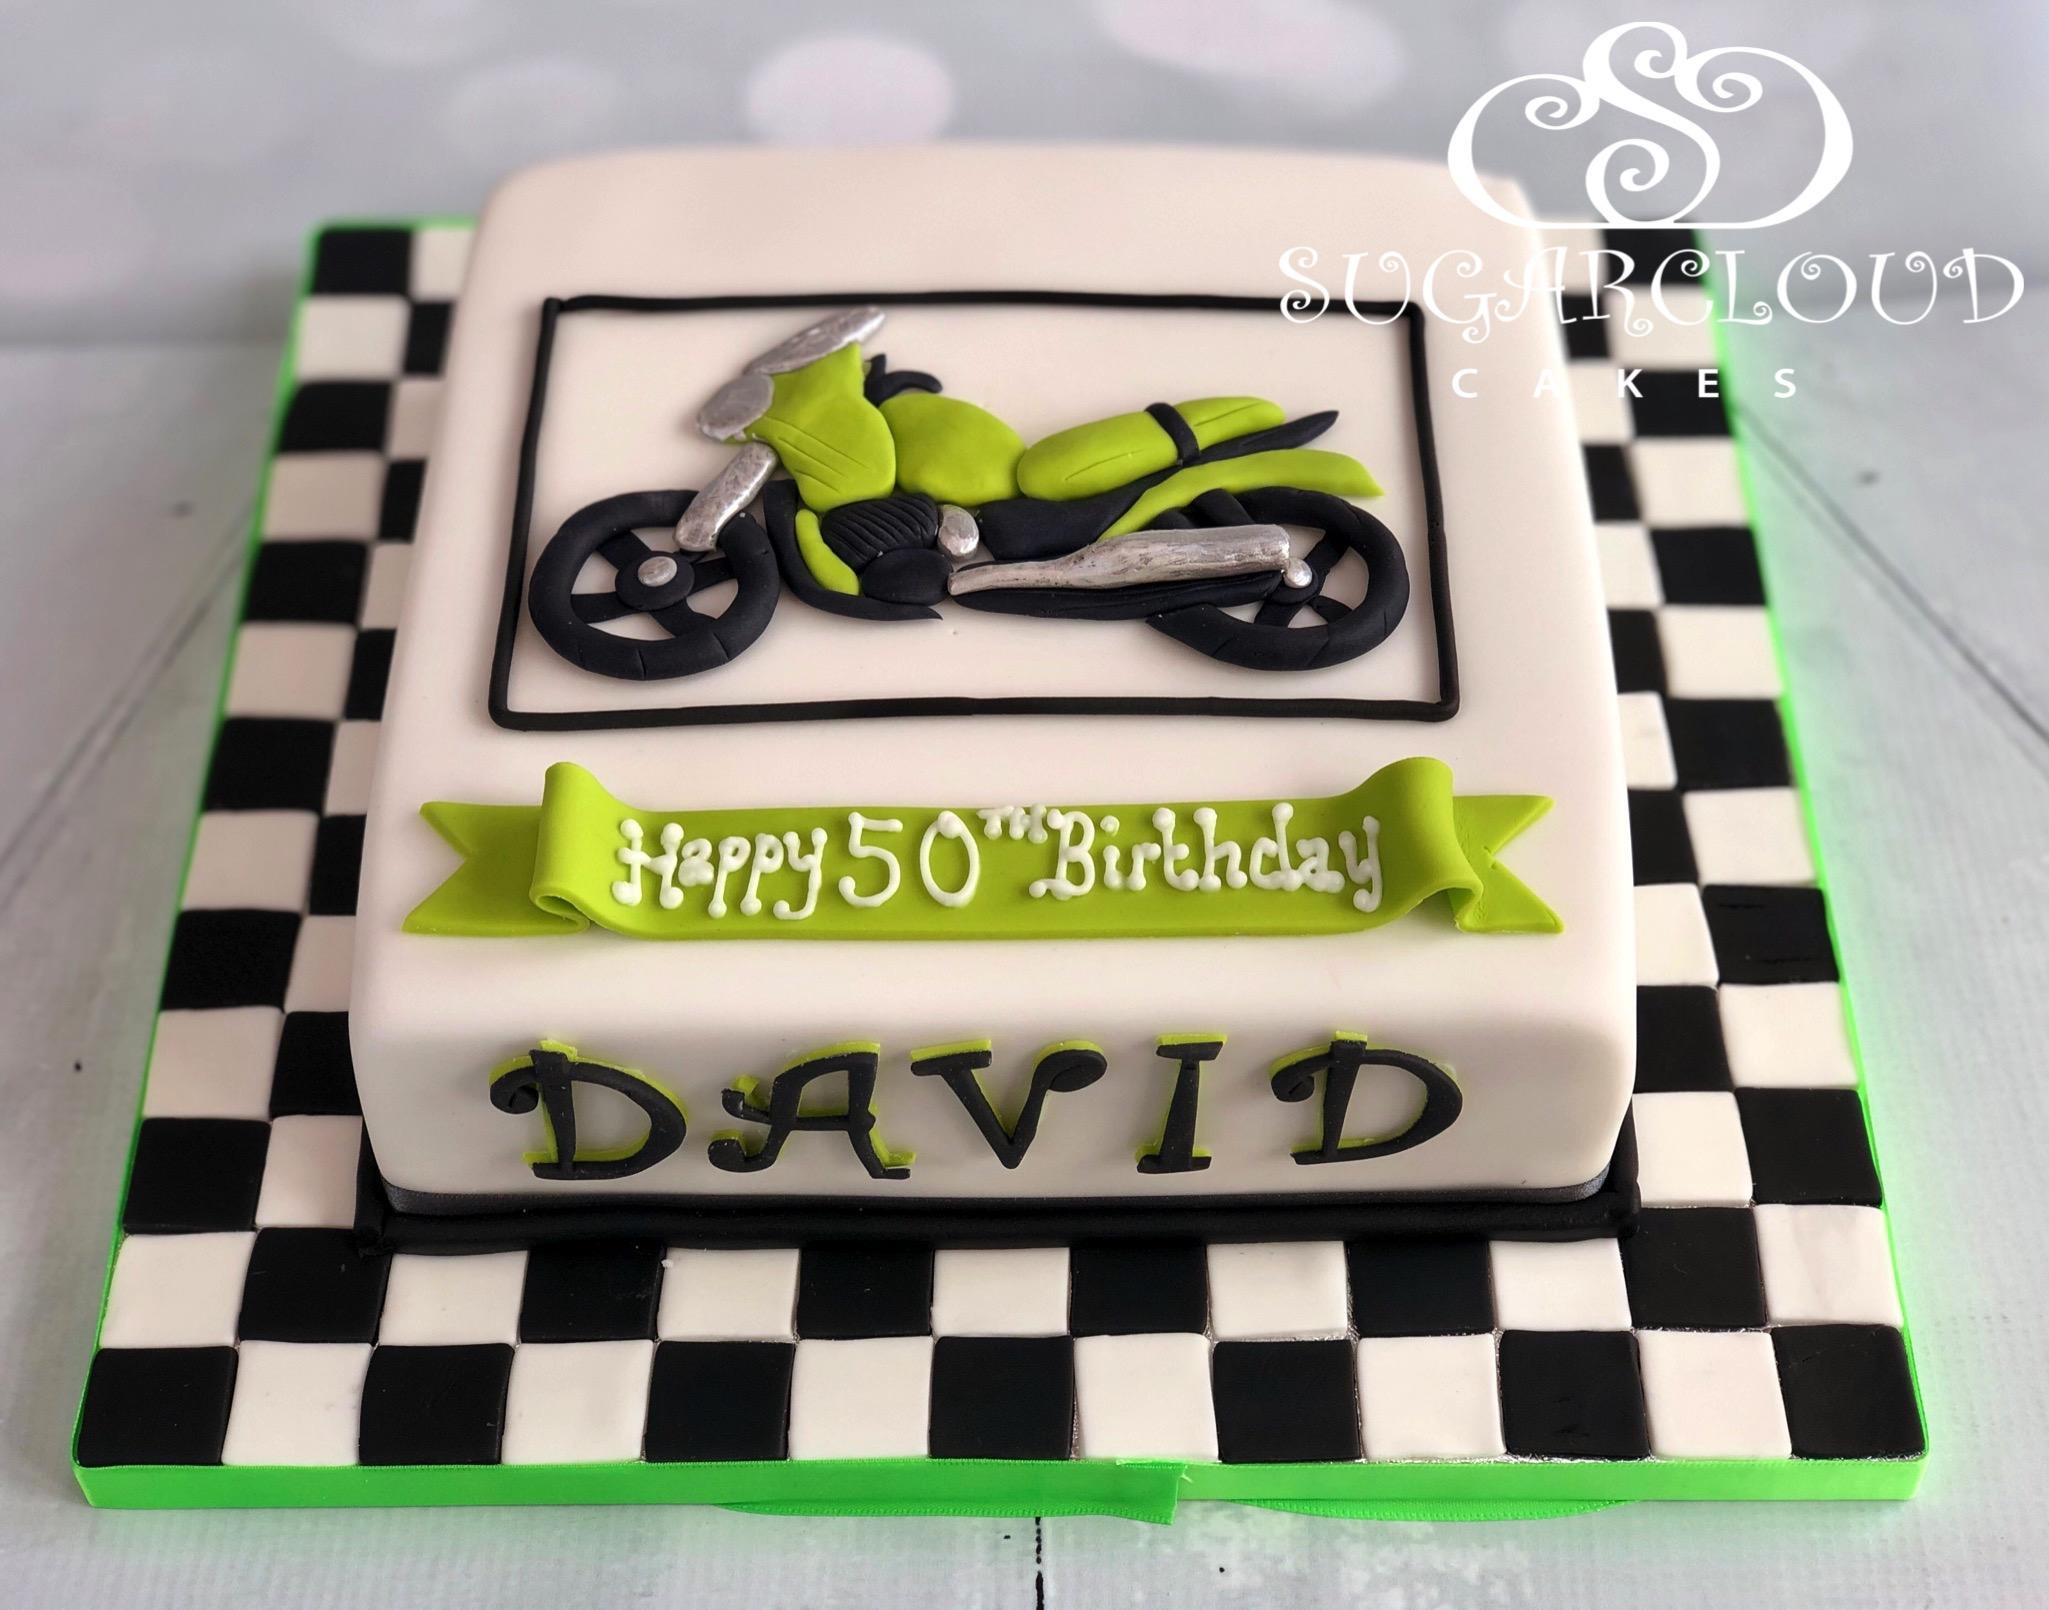 A 50th Birthday Motorbike Cake